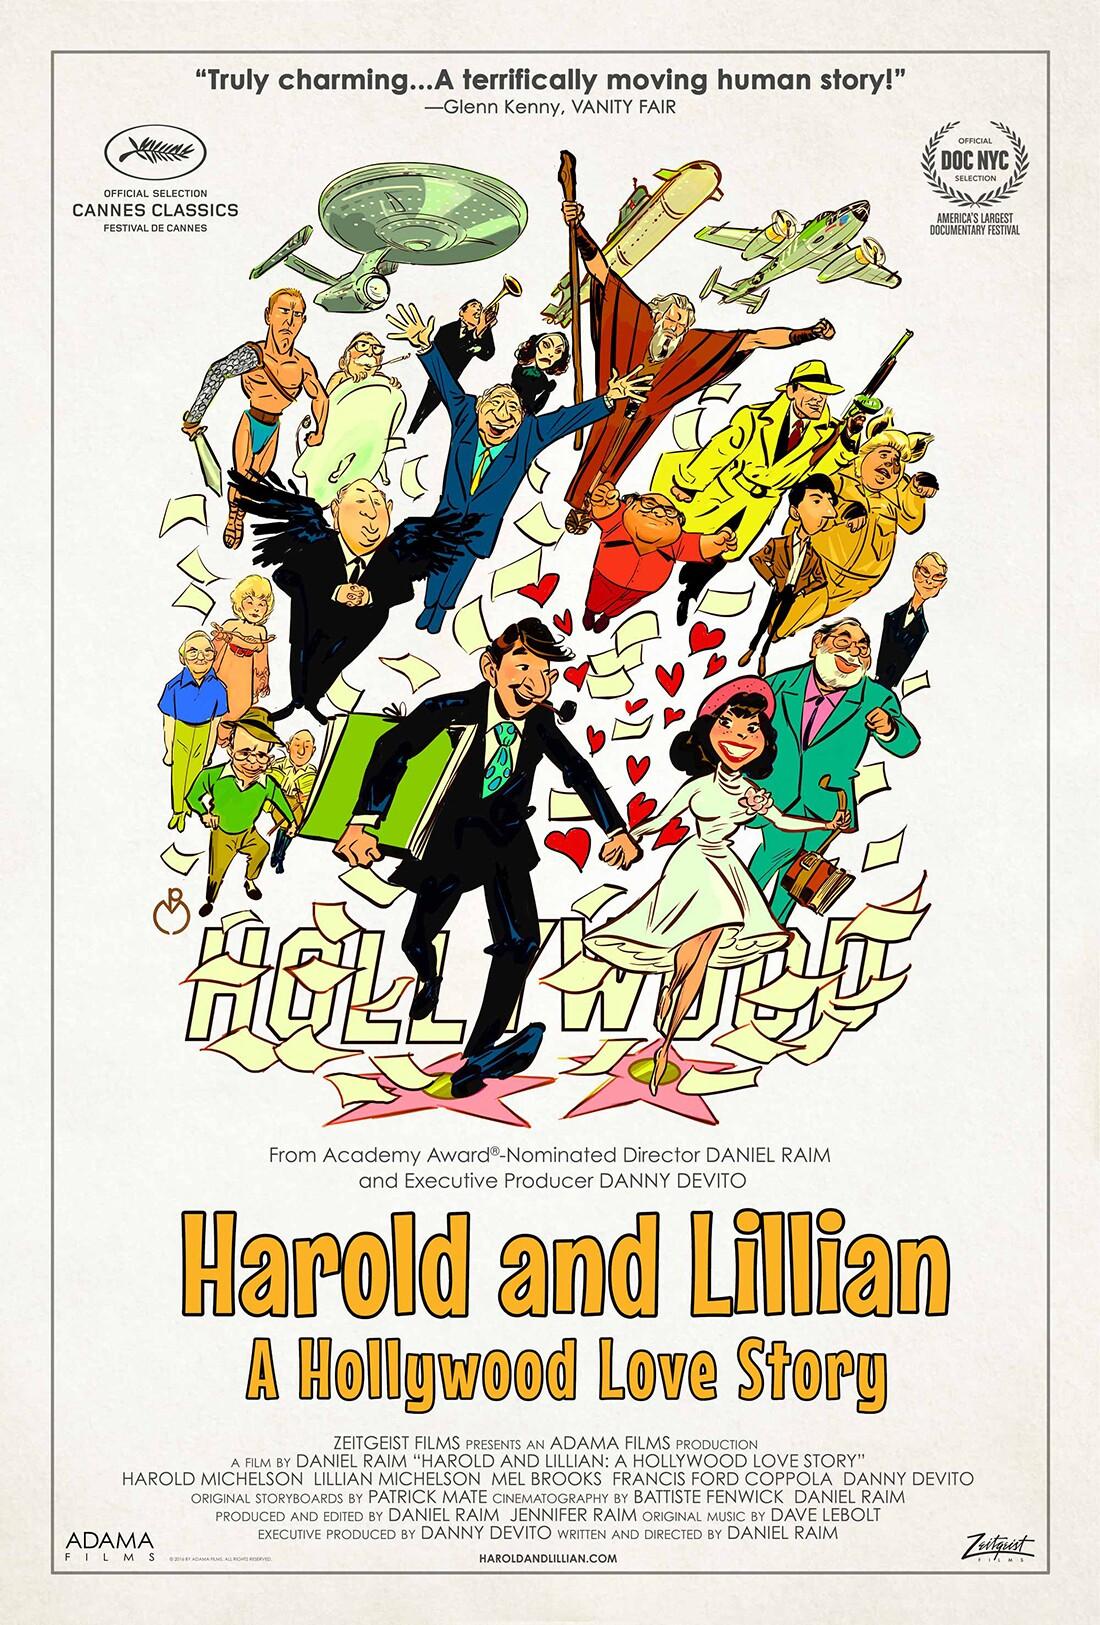 Harold and Lillian film poster | Courtesy of Adama Films/ Zeitgeist Films